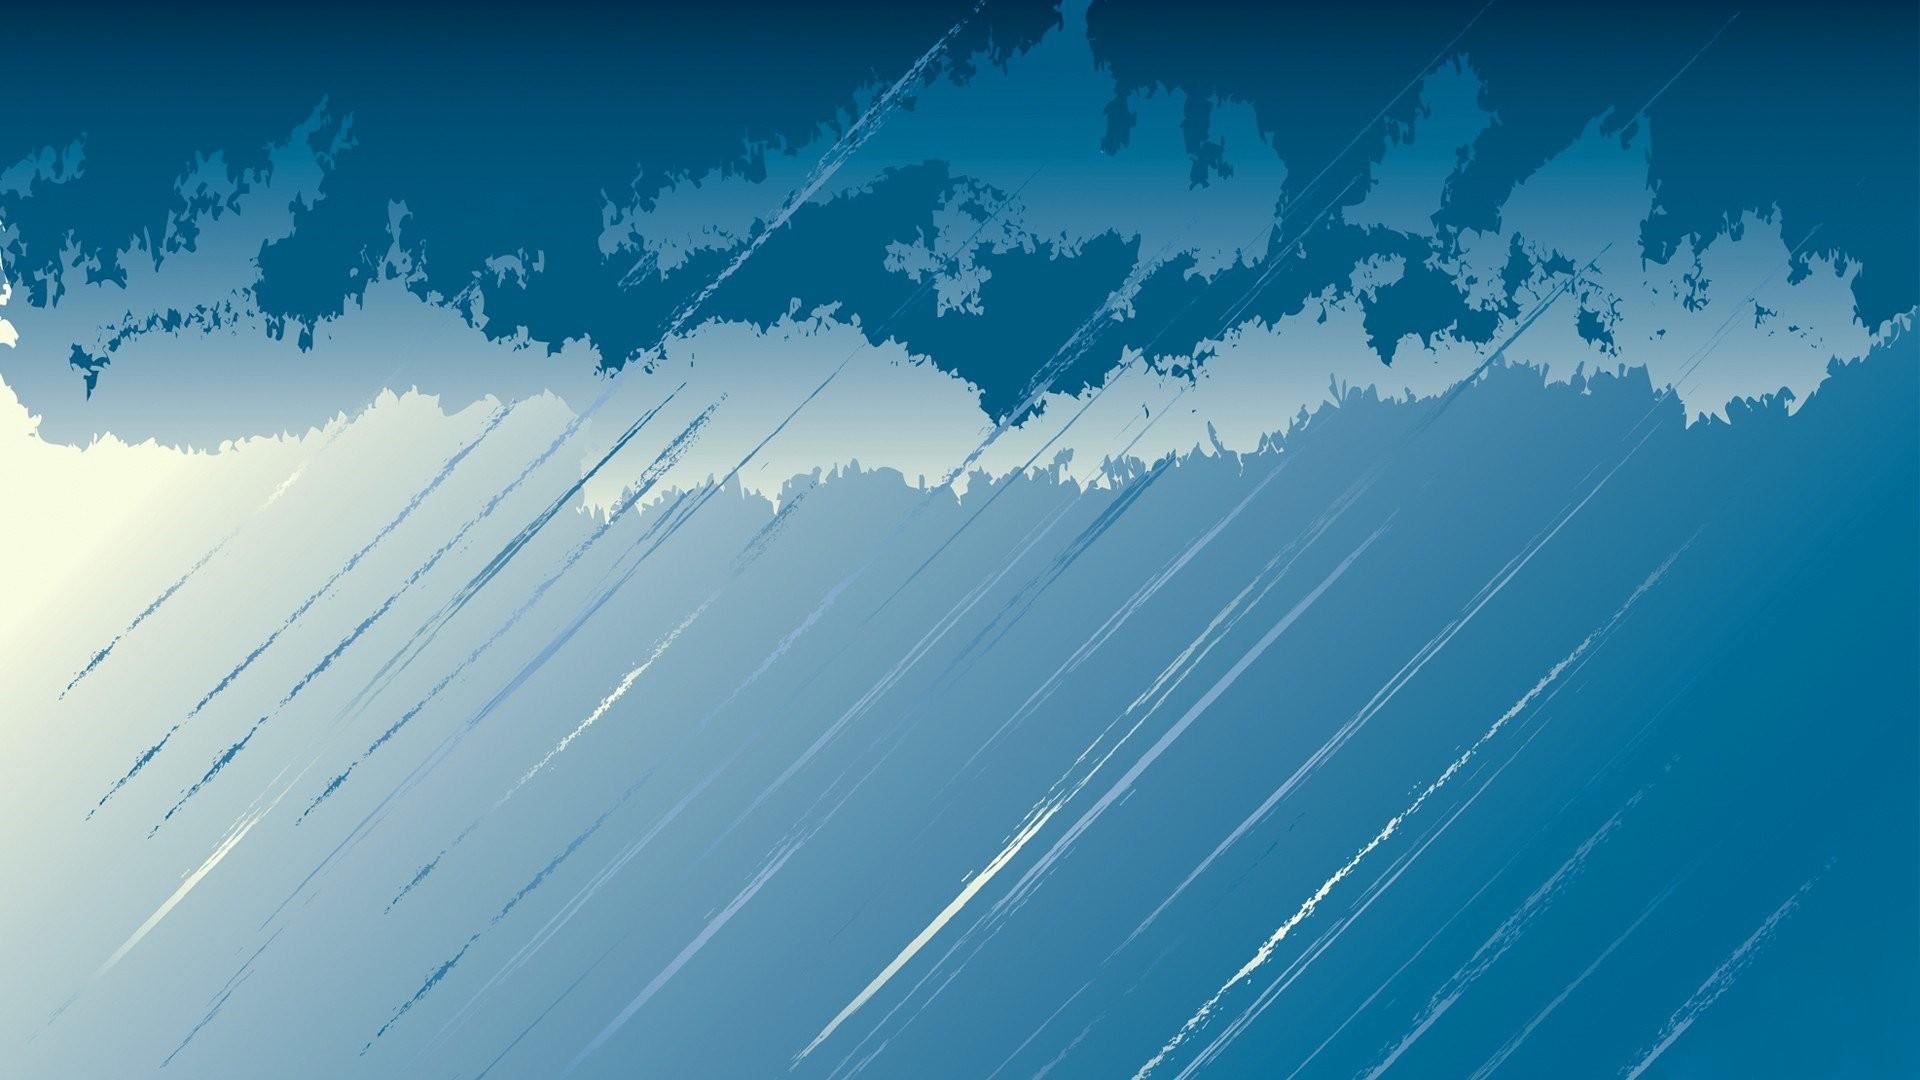 Rain Minimalist Pic